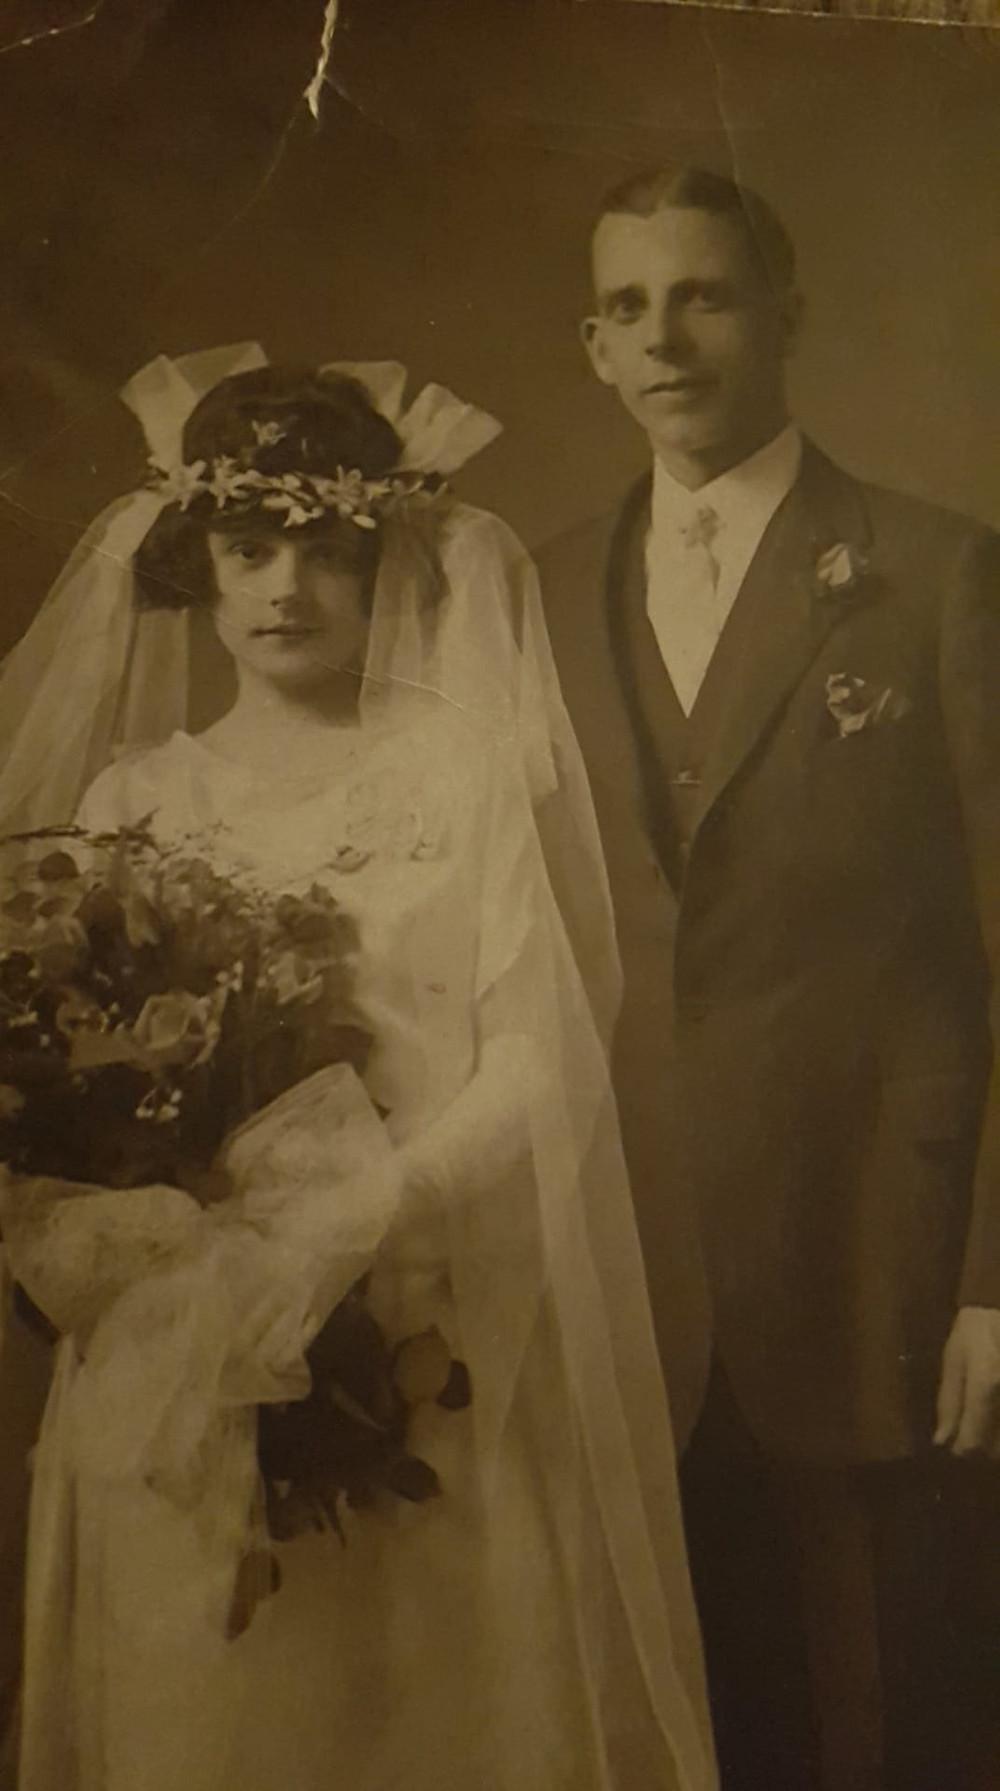 antique wedding photograph